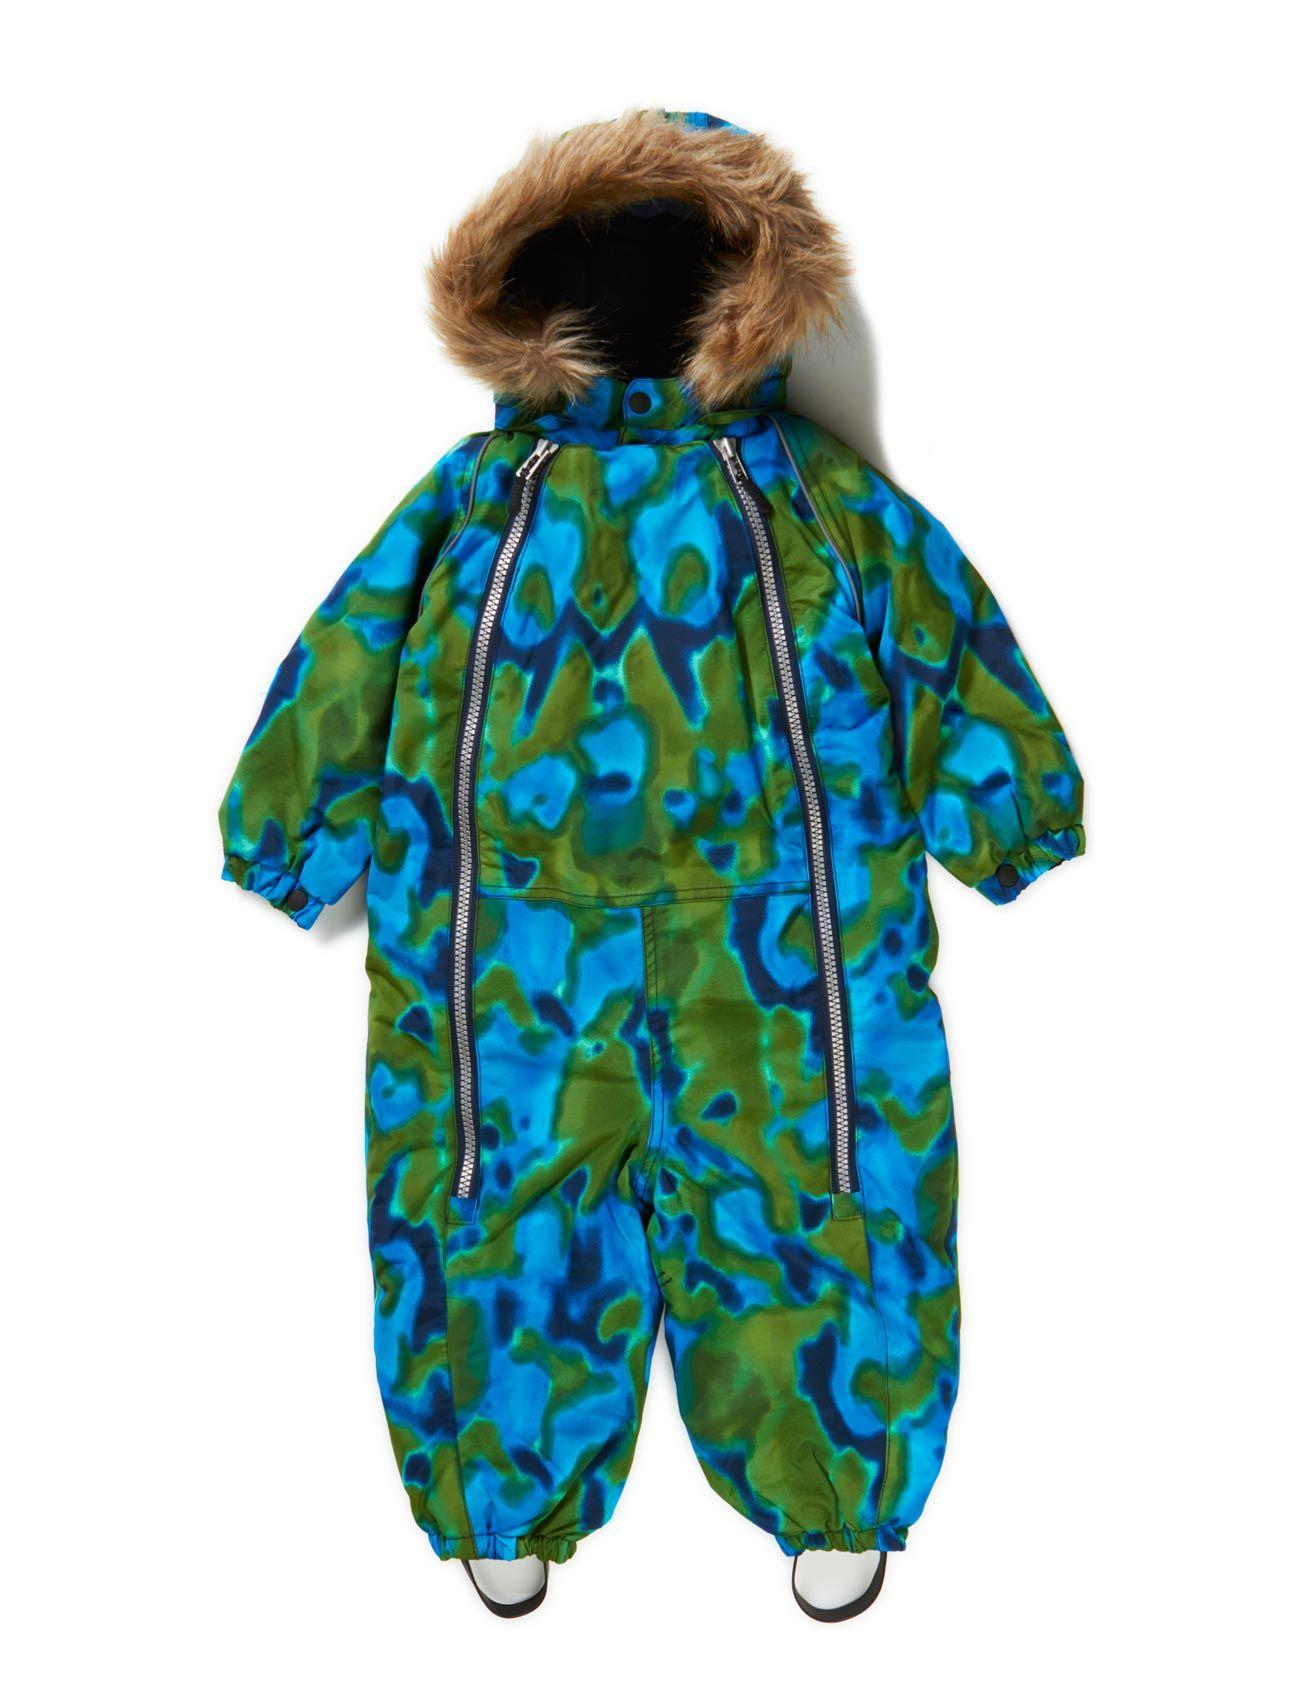 Snowbaggie Suit